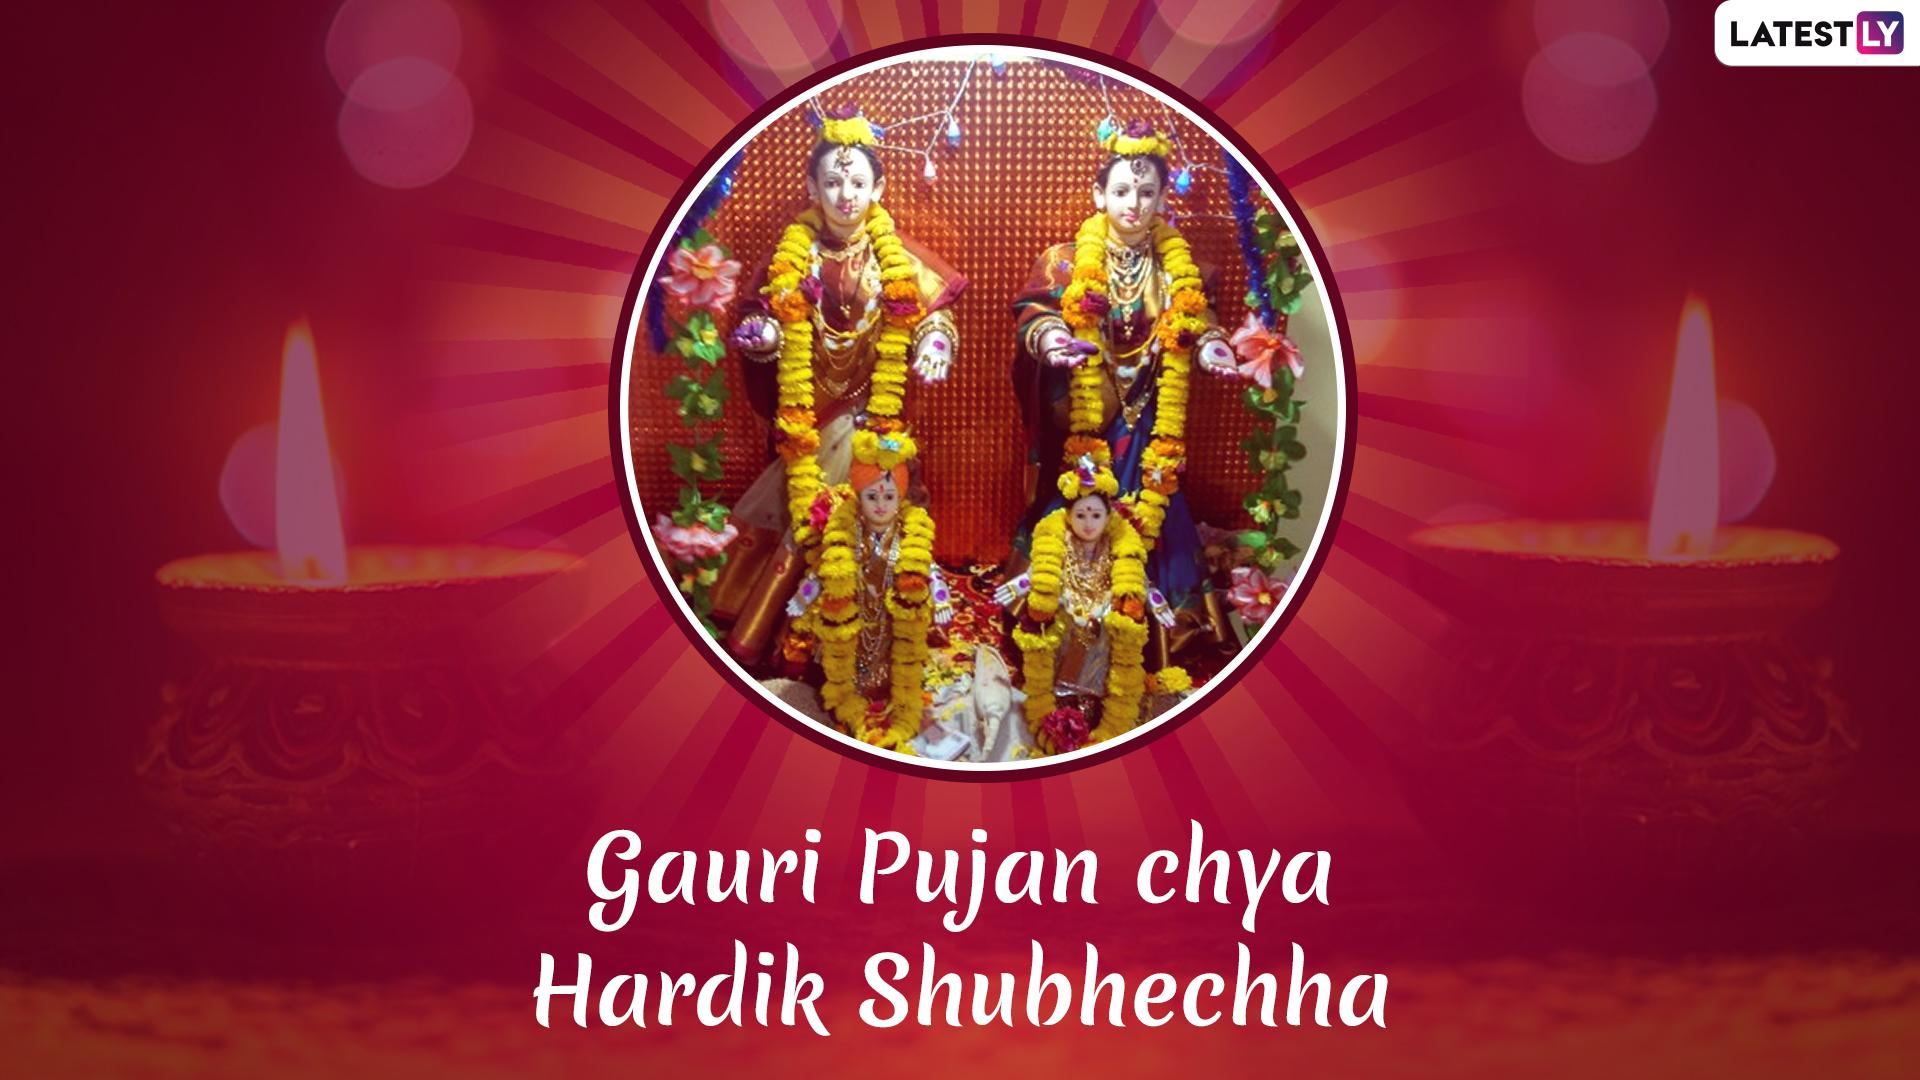 Jyeshta Gauri Puja Images & HD Wallpapers for Free ... Vadhdivas Chya Hardik Shubhechha Hd